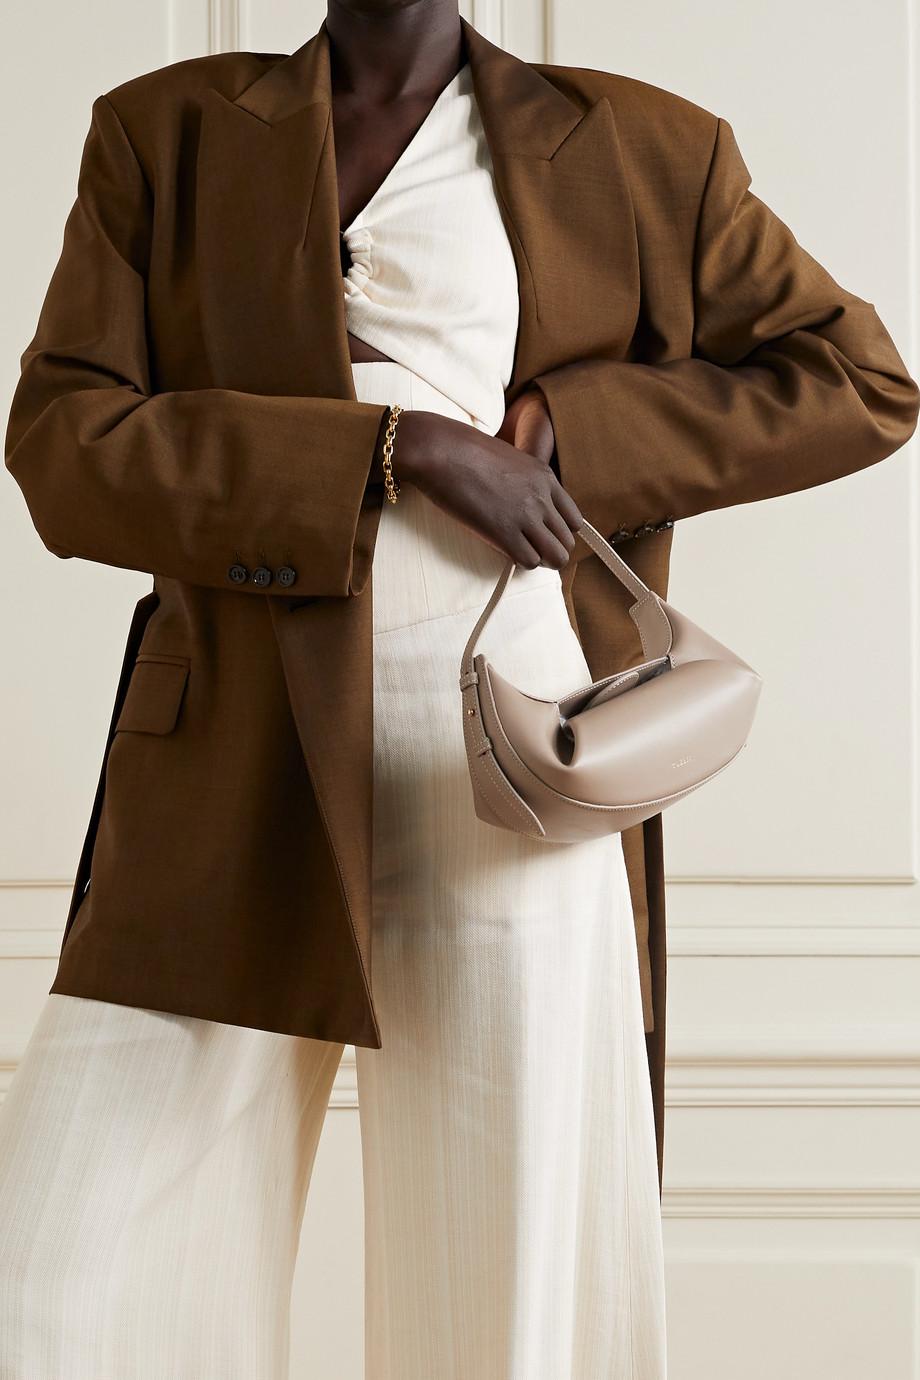 Yuzefi Fortune Cookie mini leather tote